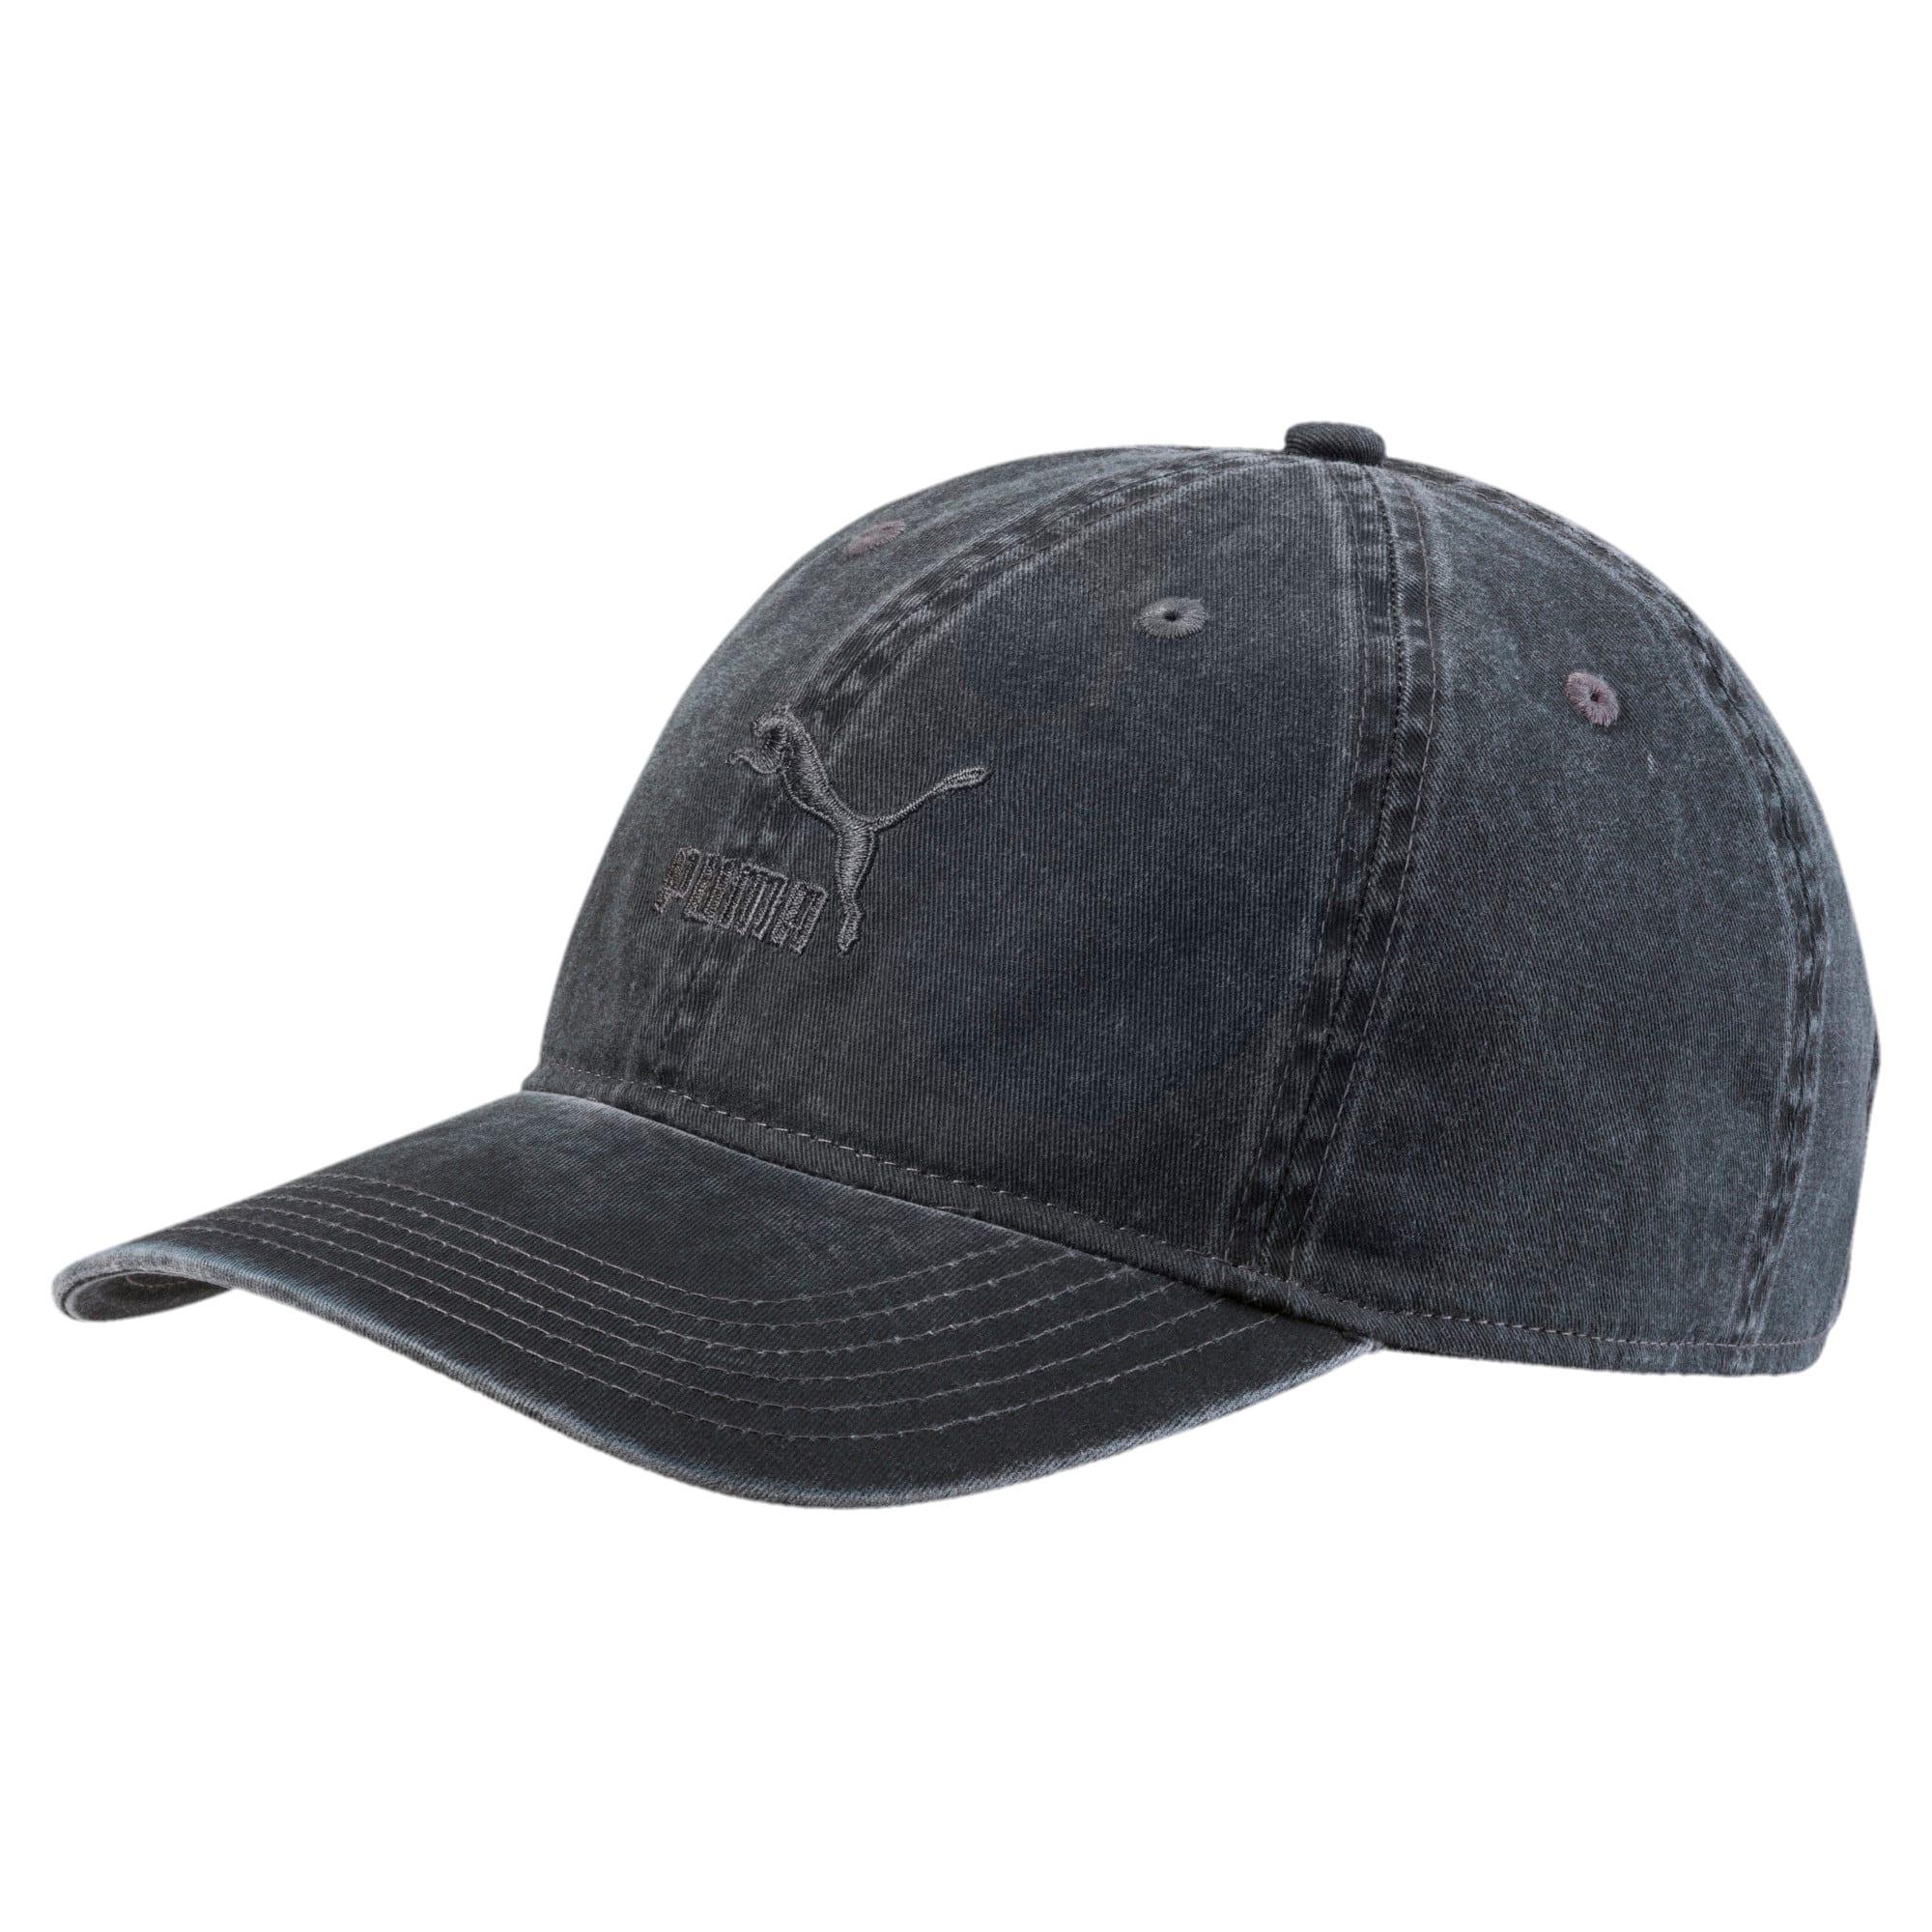 Thumbnail 1 of ARCHIVE BB cap, Puma Black, medium